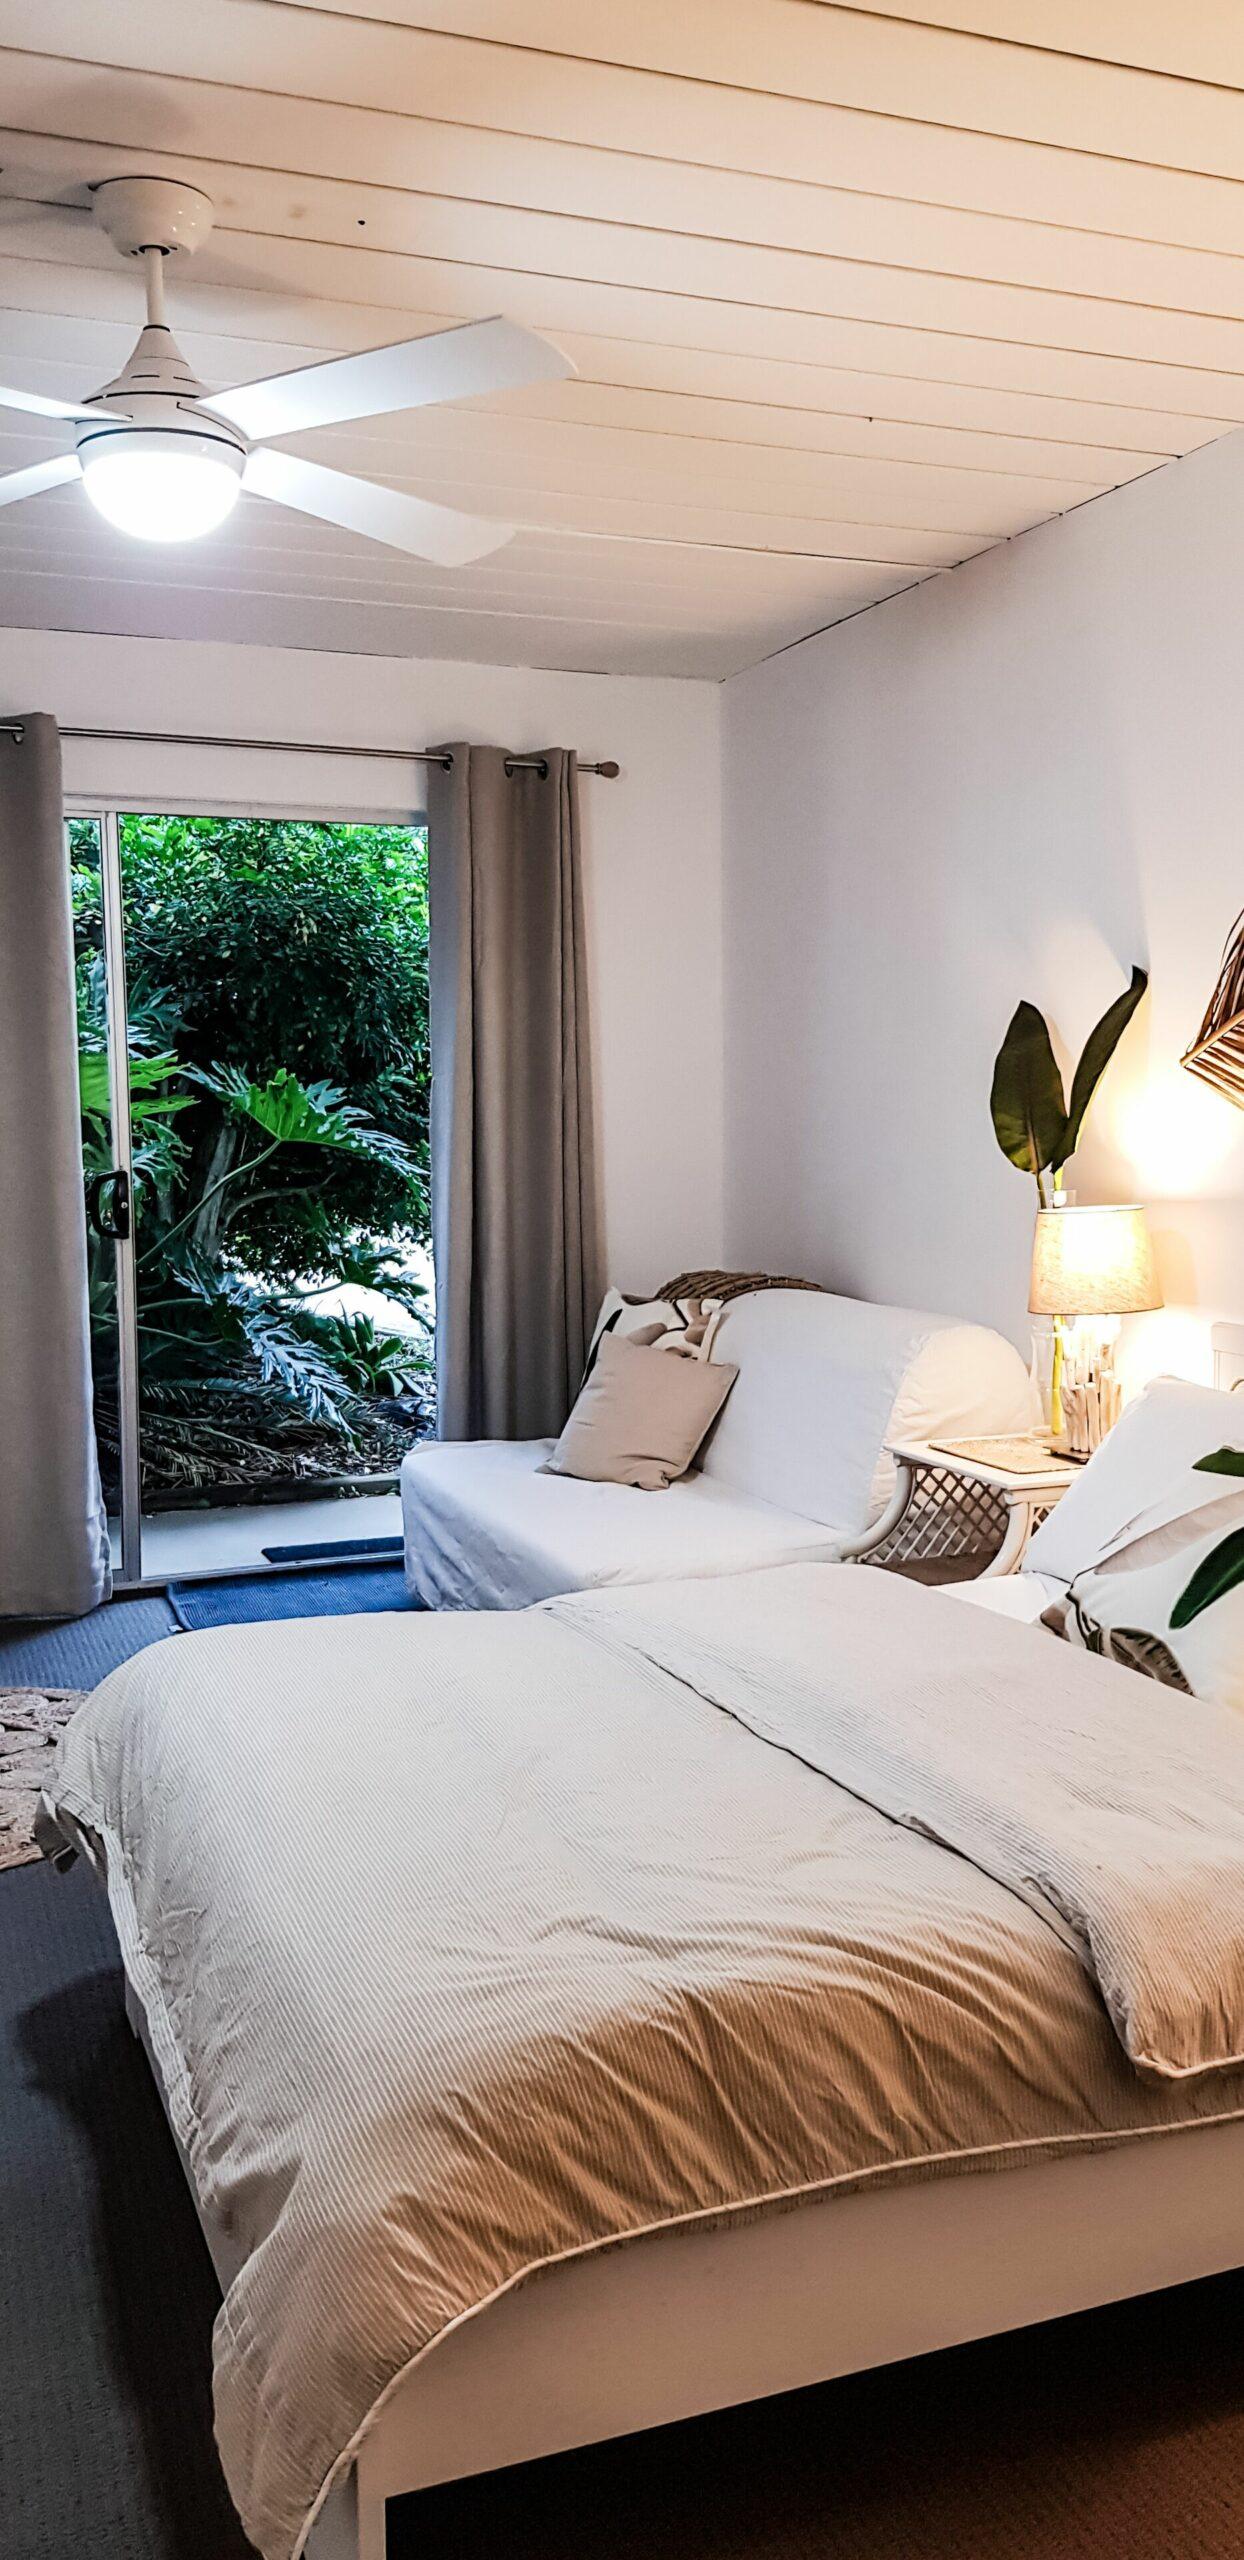 Koco Palms Guest Suite- Korora, Coffs Harbour- 5 Mins Walk to the Korora Beach